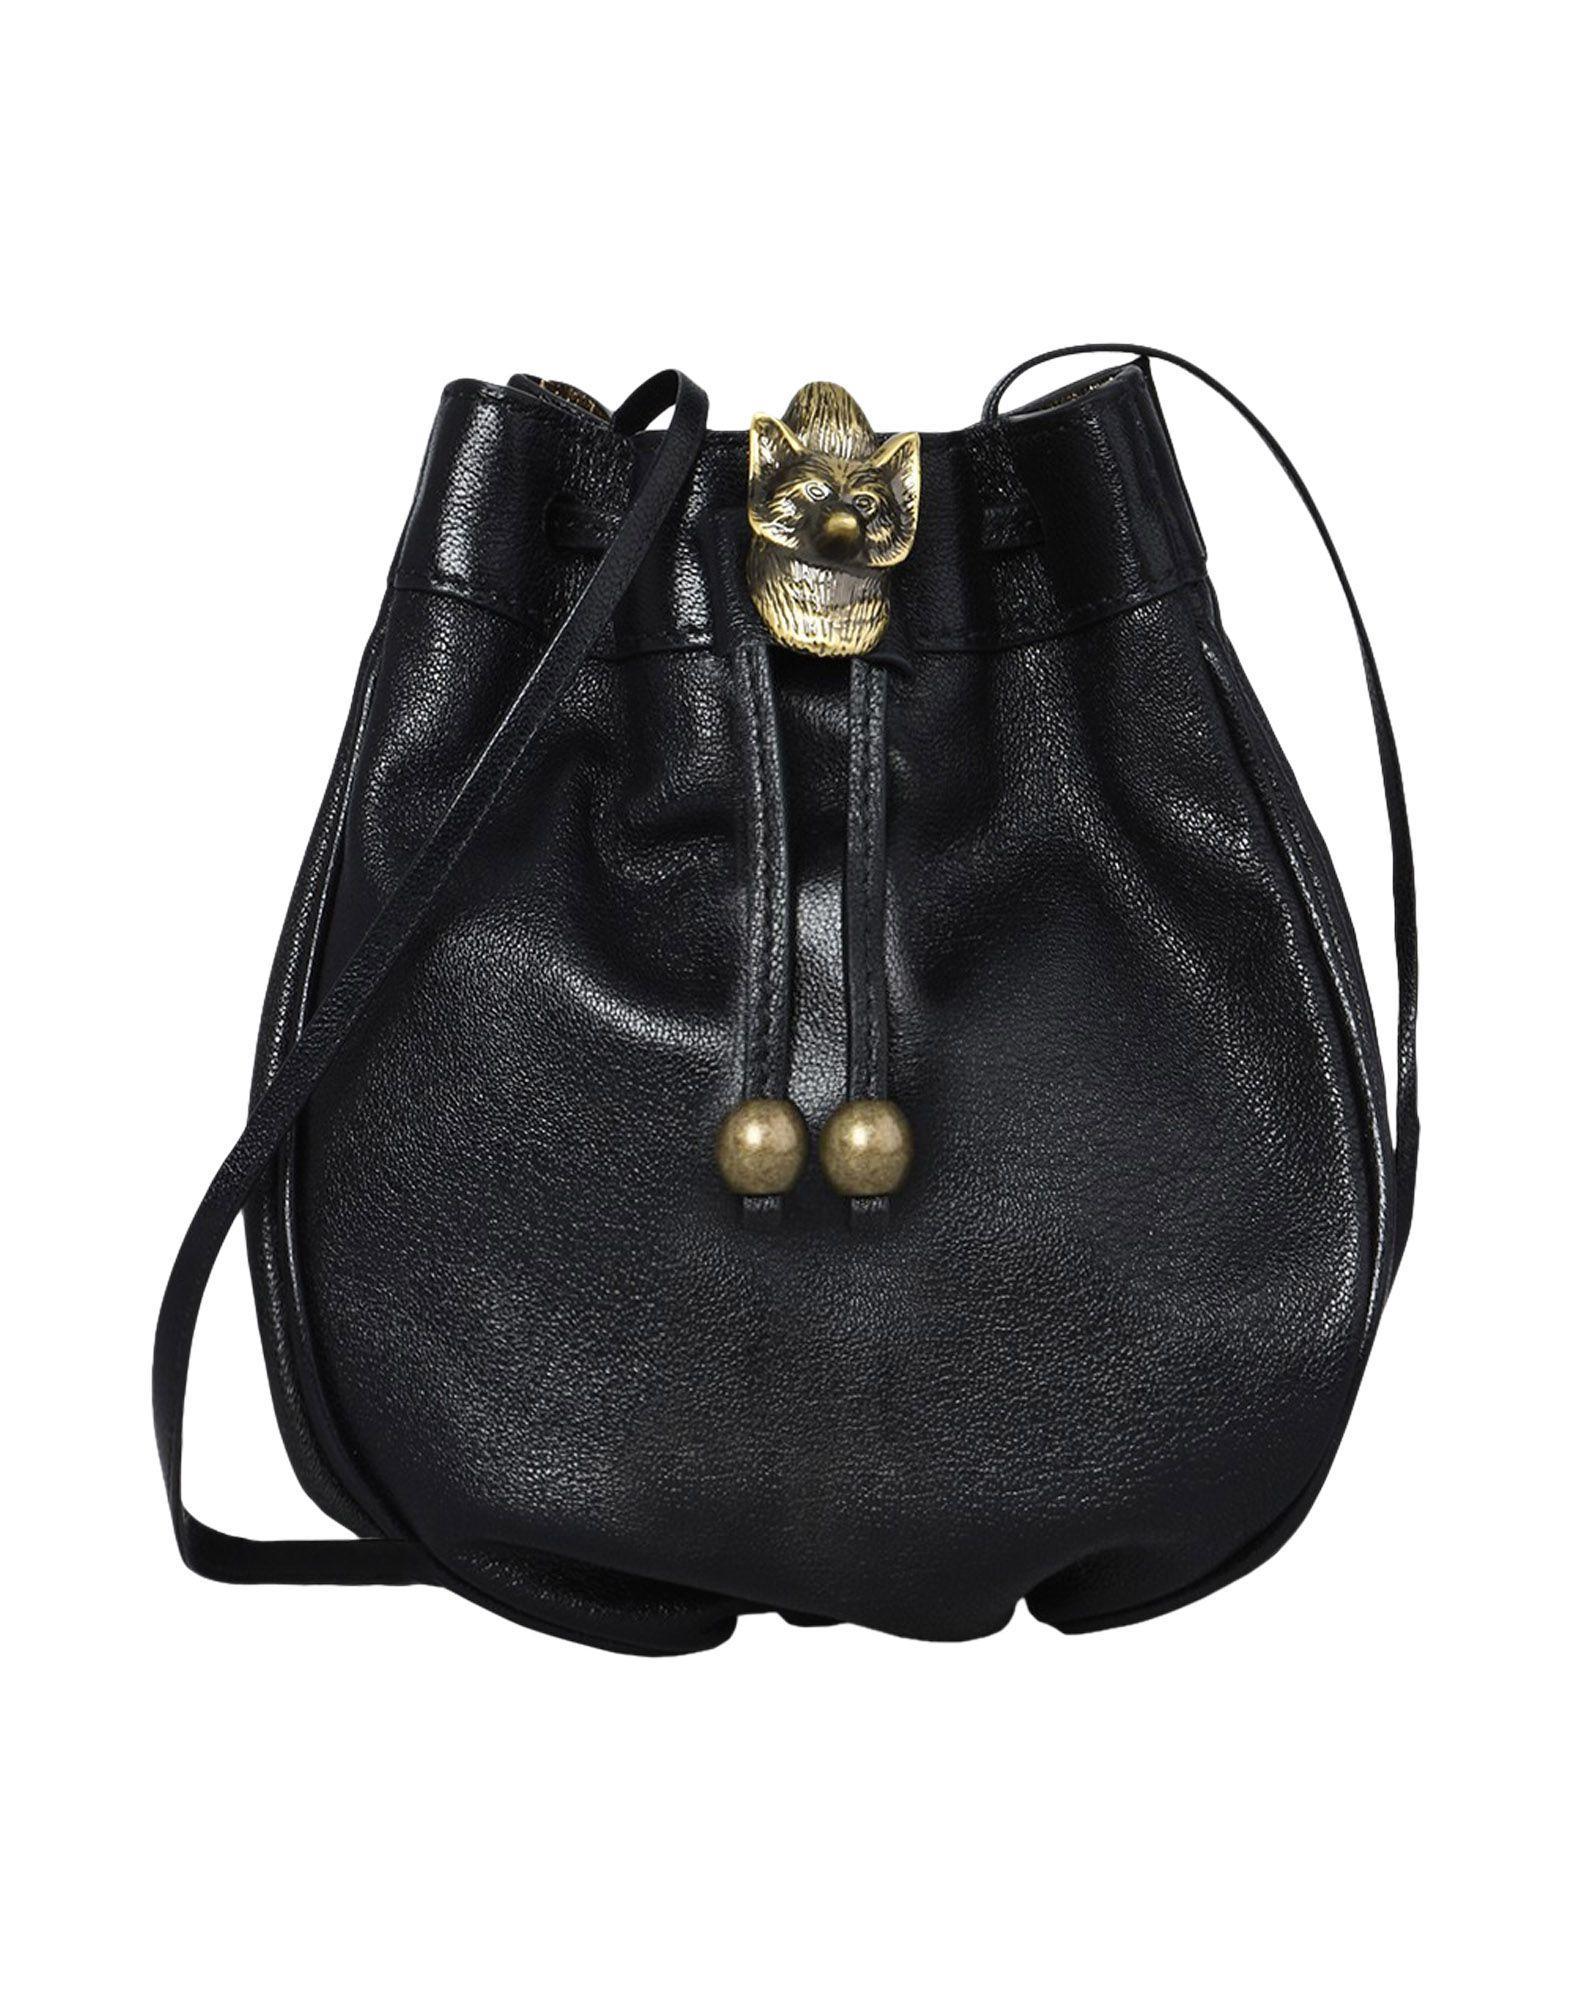 Philosophy Di Lorenzo Serafini Across-body Bag In Black